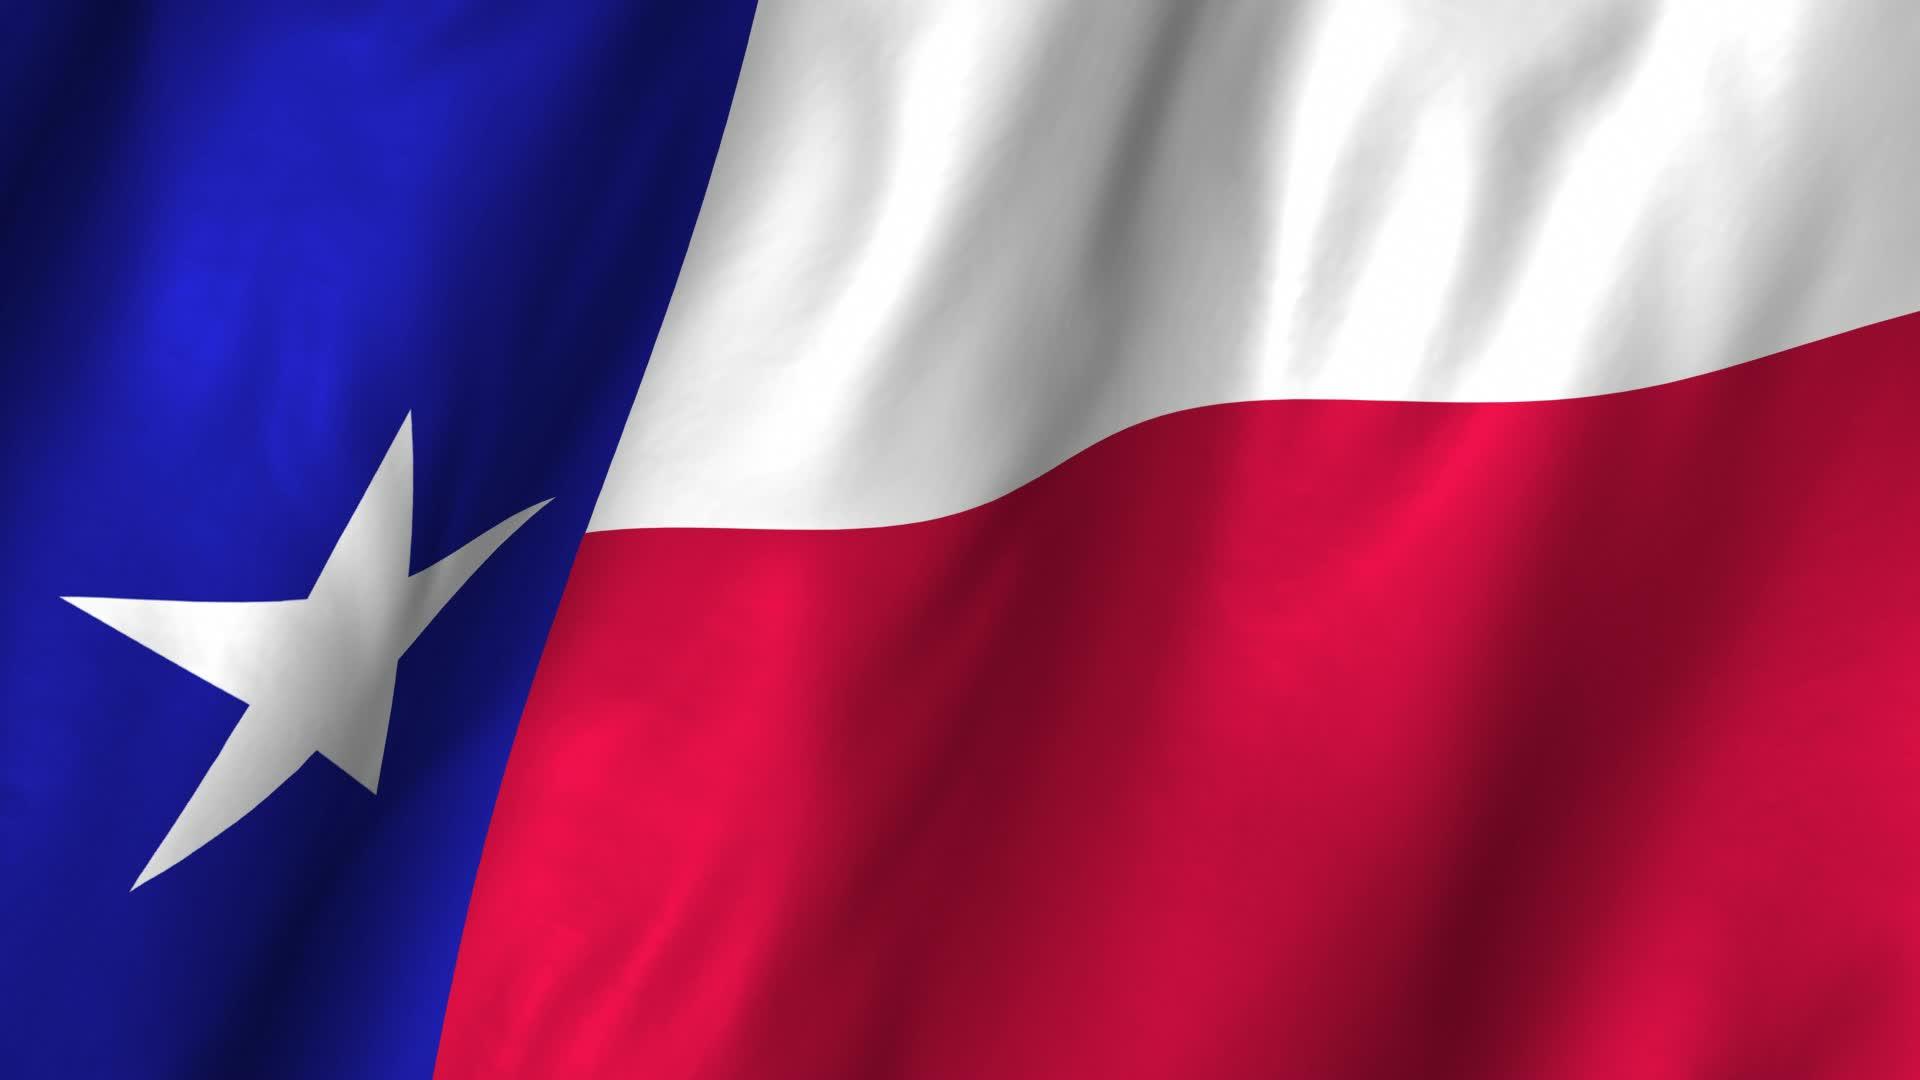 Flag Texas : Katinabags.com